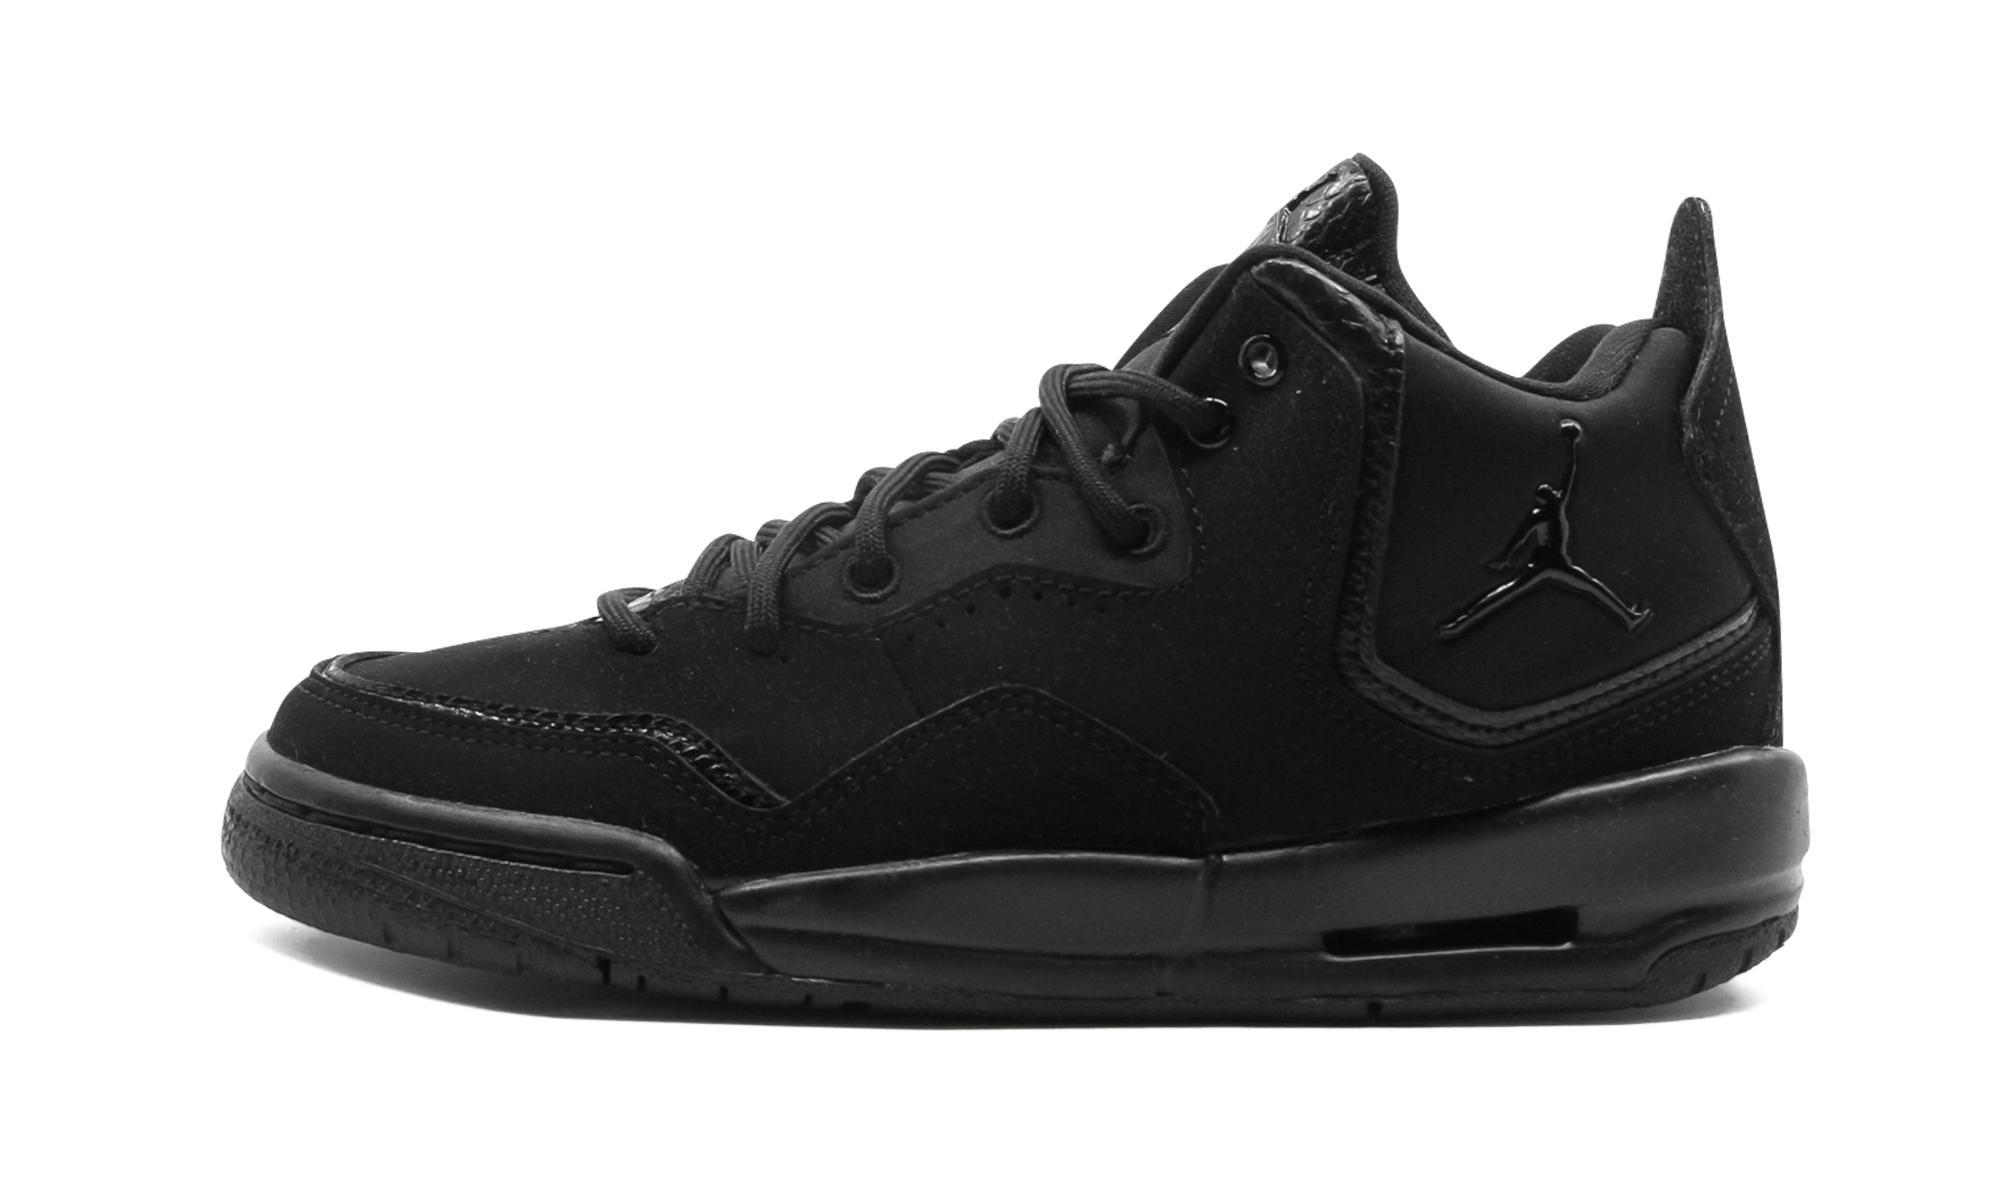 3f67d5186b7 Lyst - Nike Courtside 23 (gs) in Black for Men